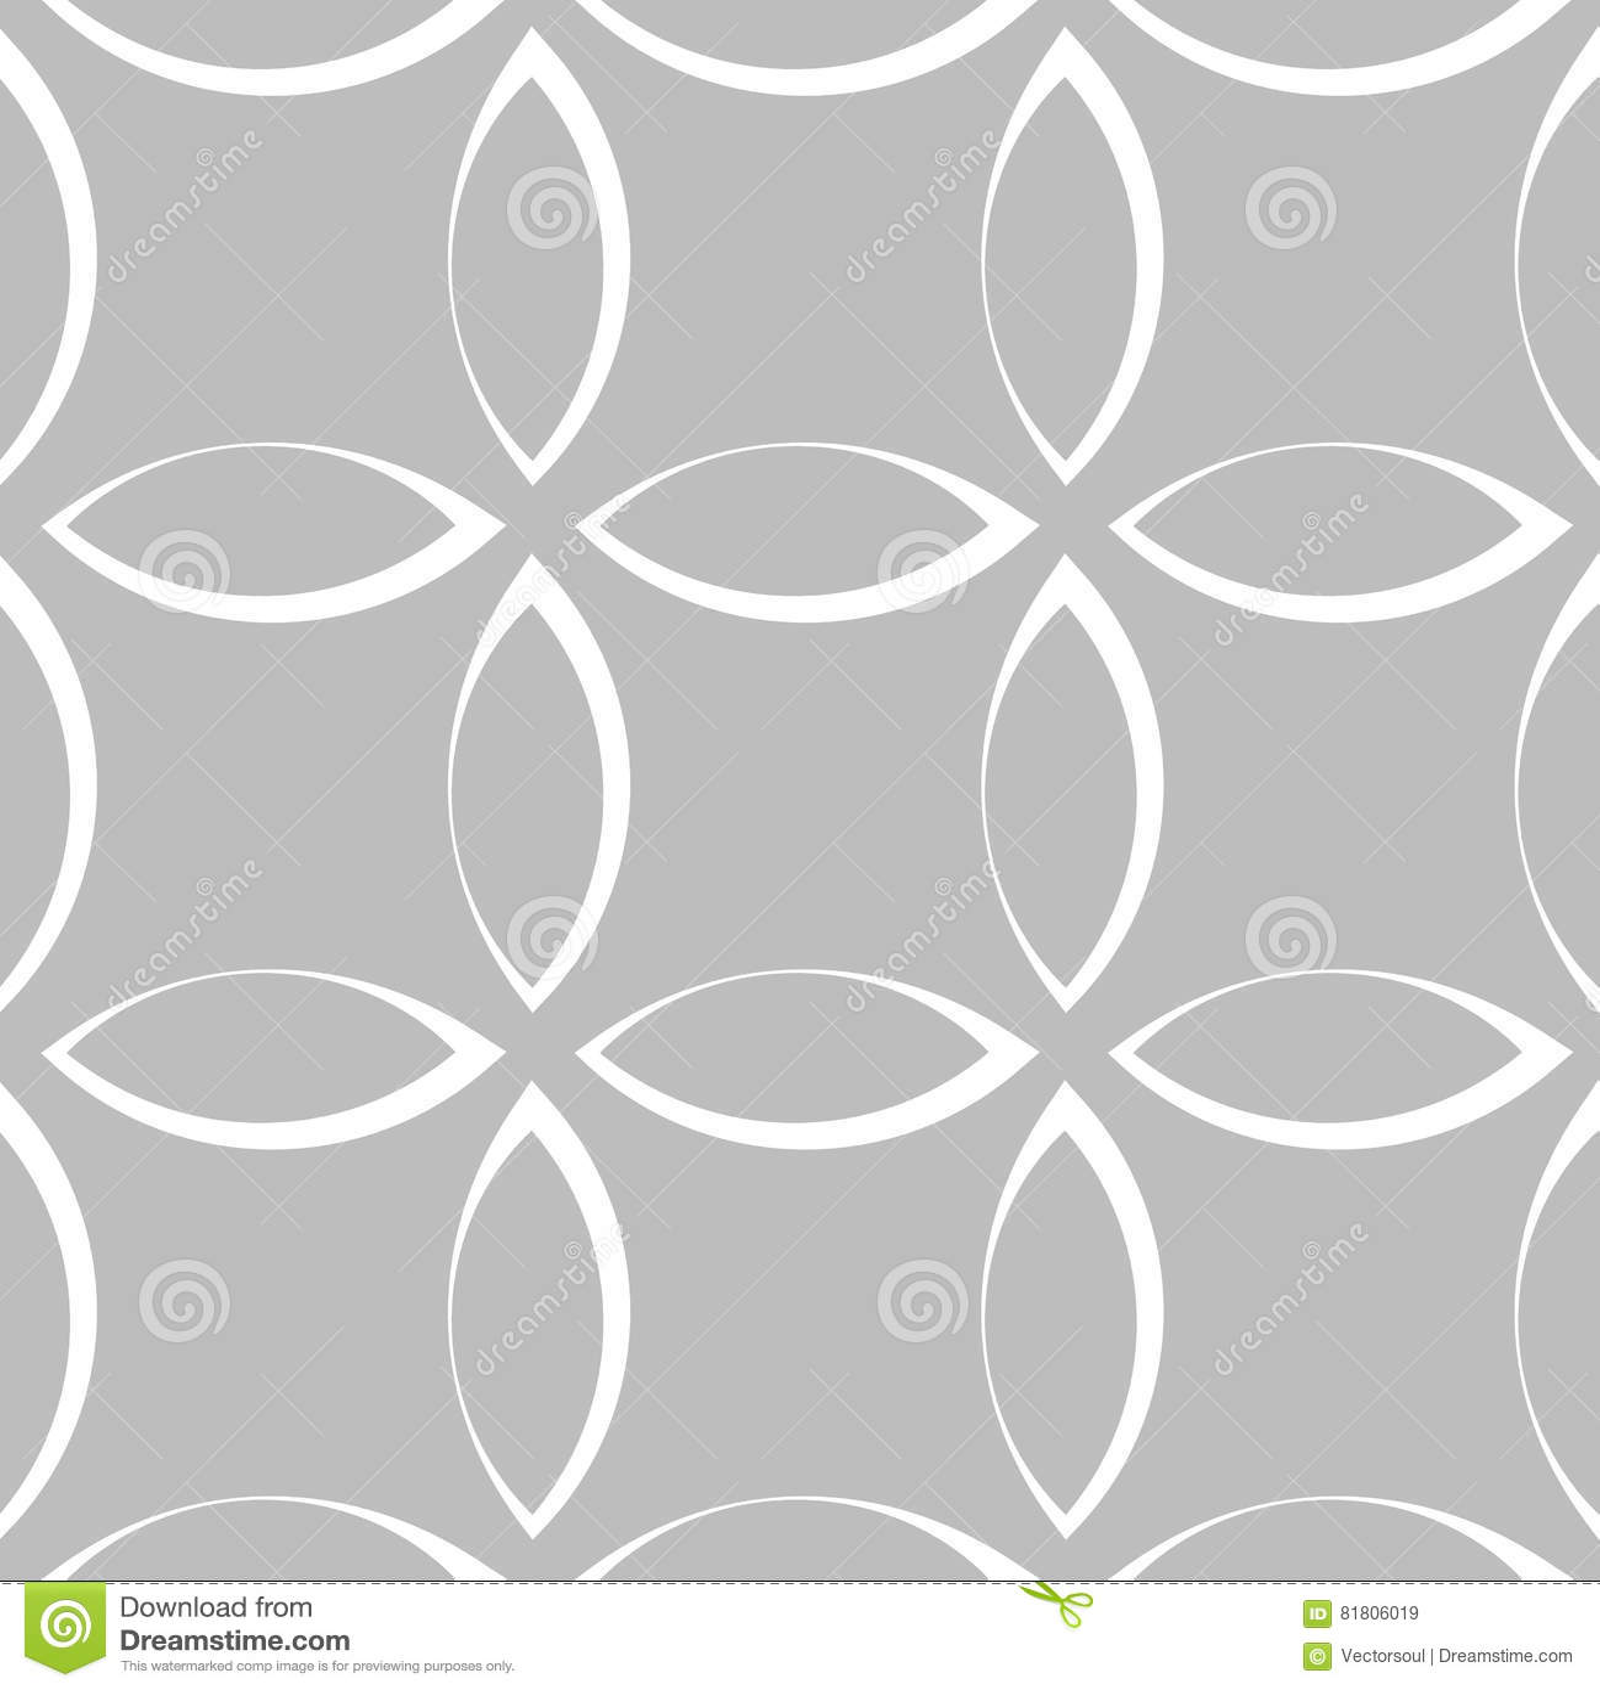 Monochrome повторяющийся картина с формами лепестка/цветка/лист